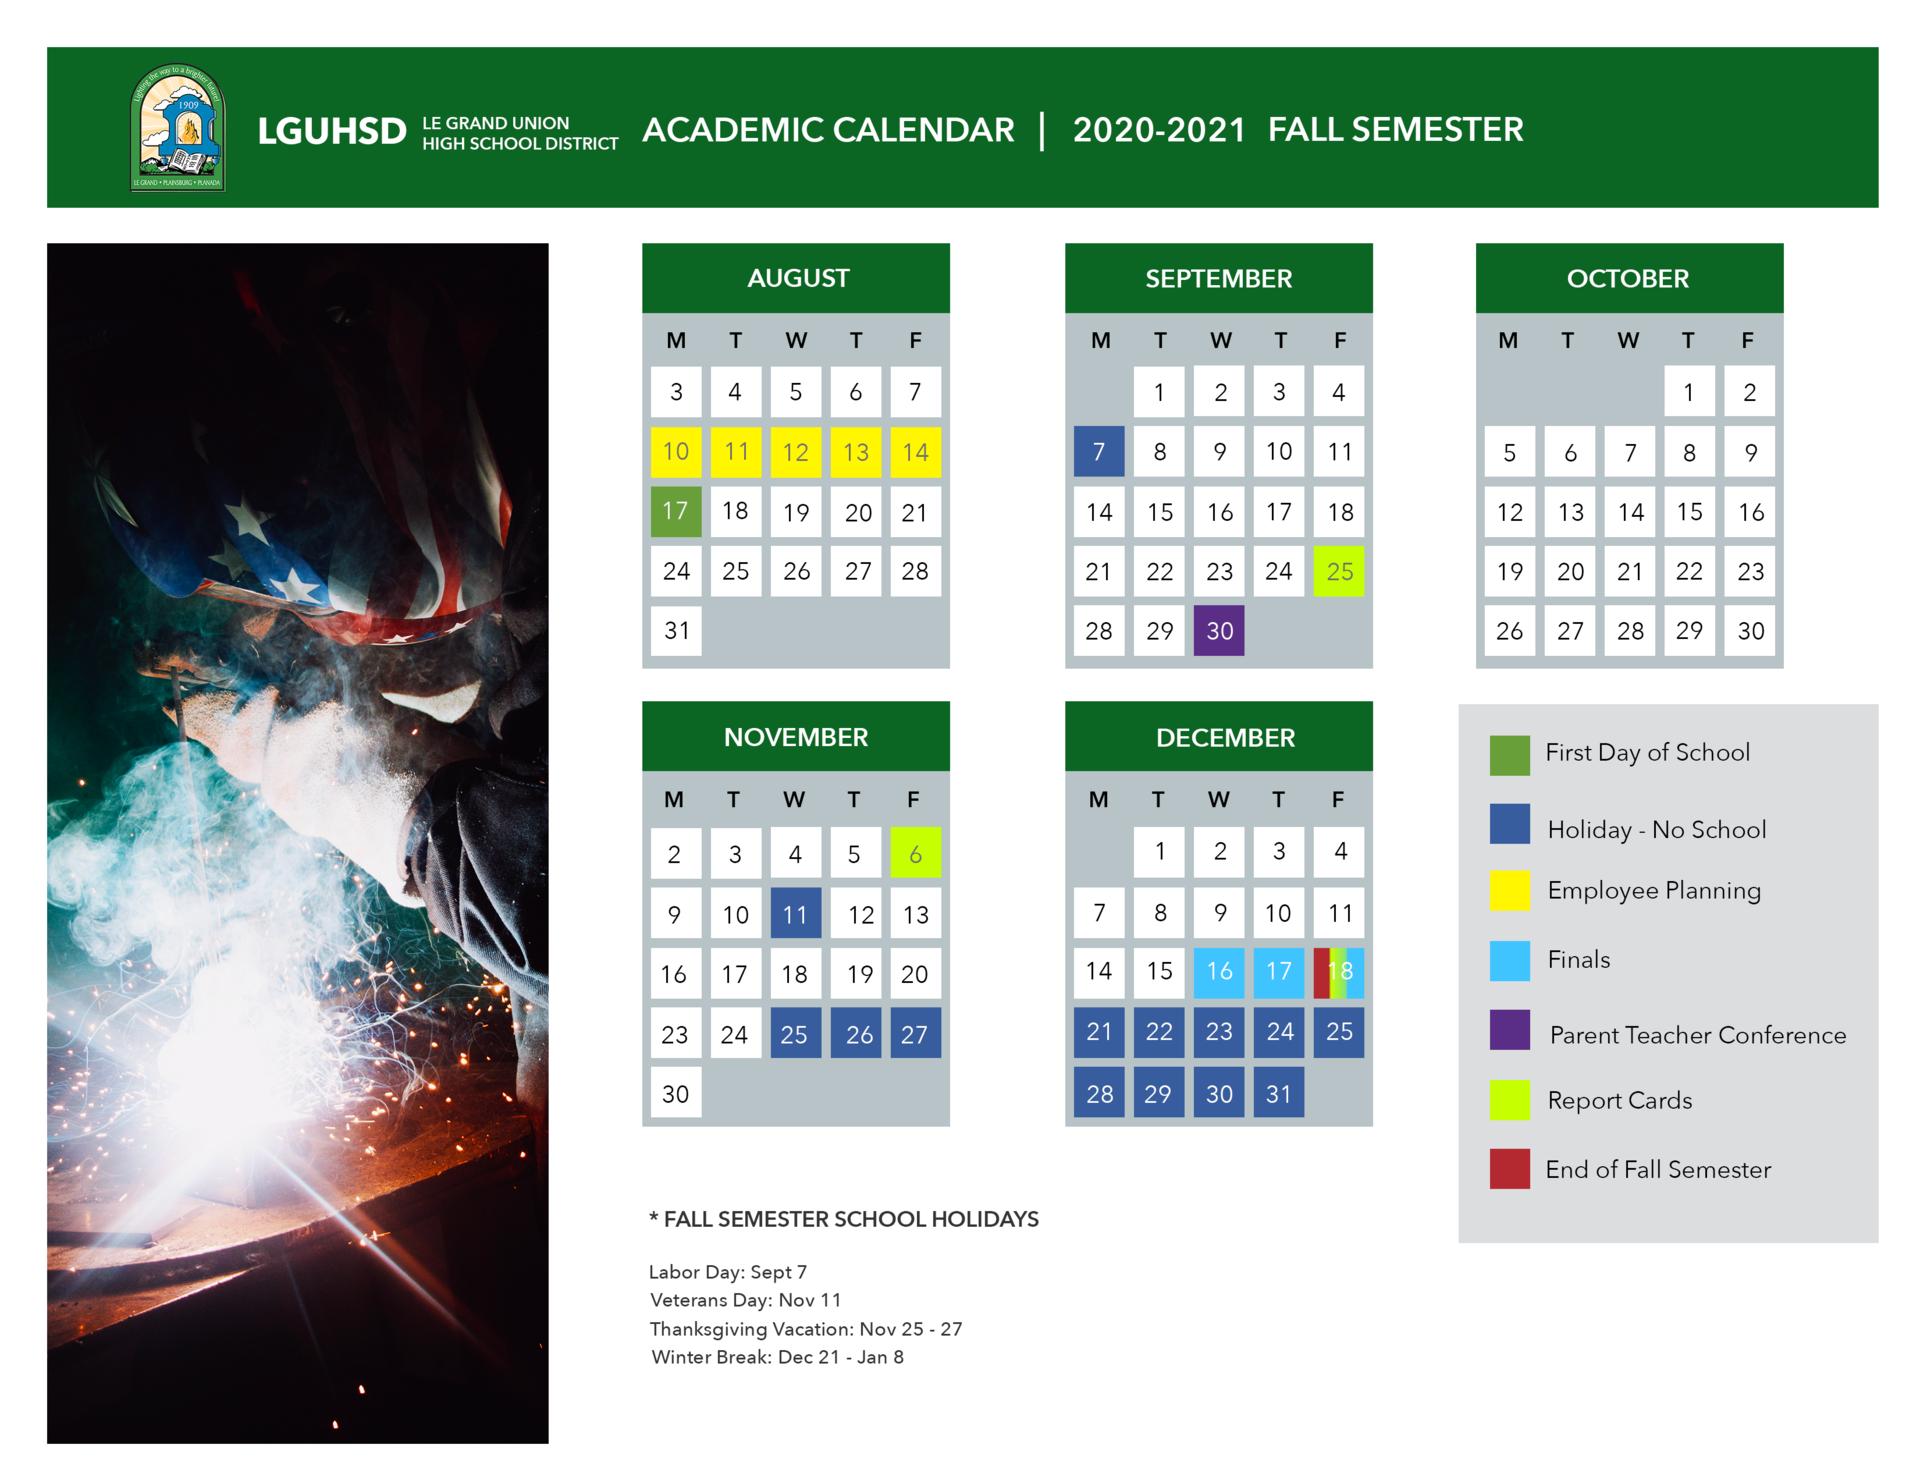 School Calendar – District – Le Grand Union High School Within Grand Canyon University Calendar 2021 2020